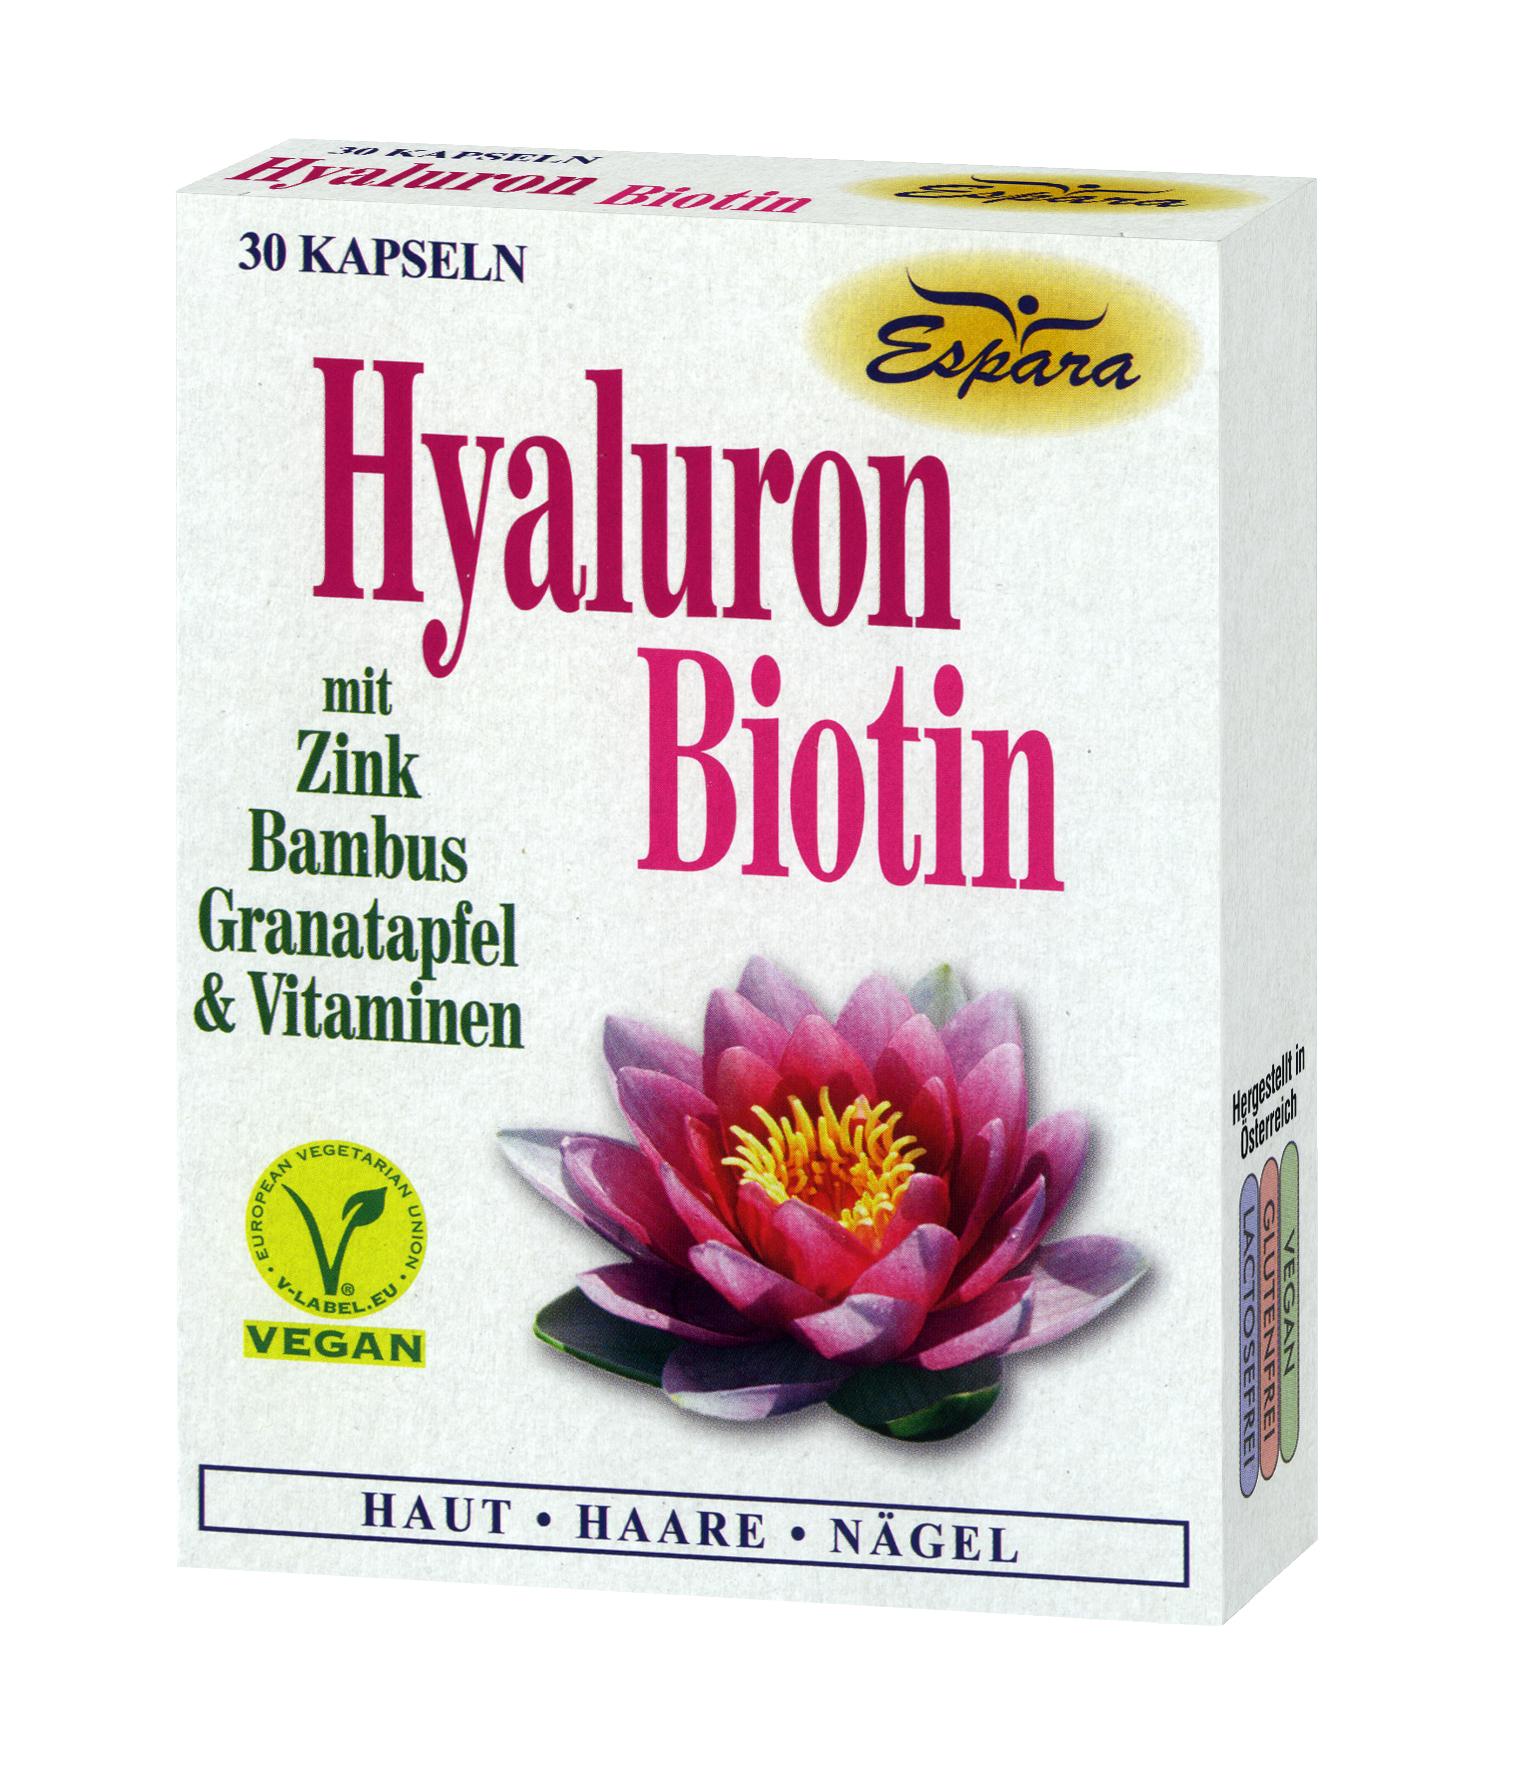 Espara Hyaluron-Biotin Kapseln